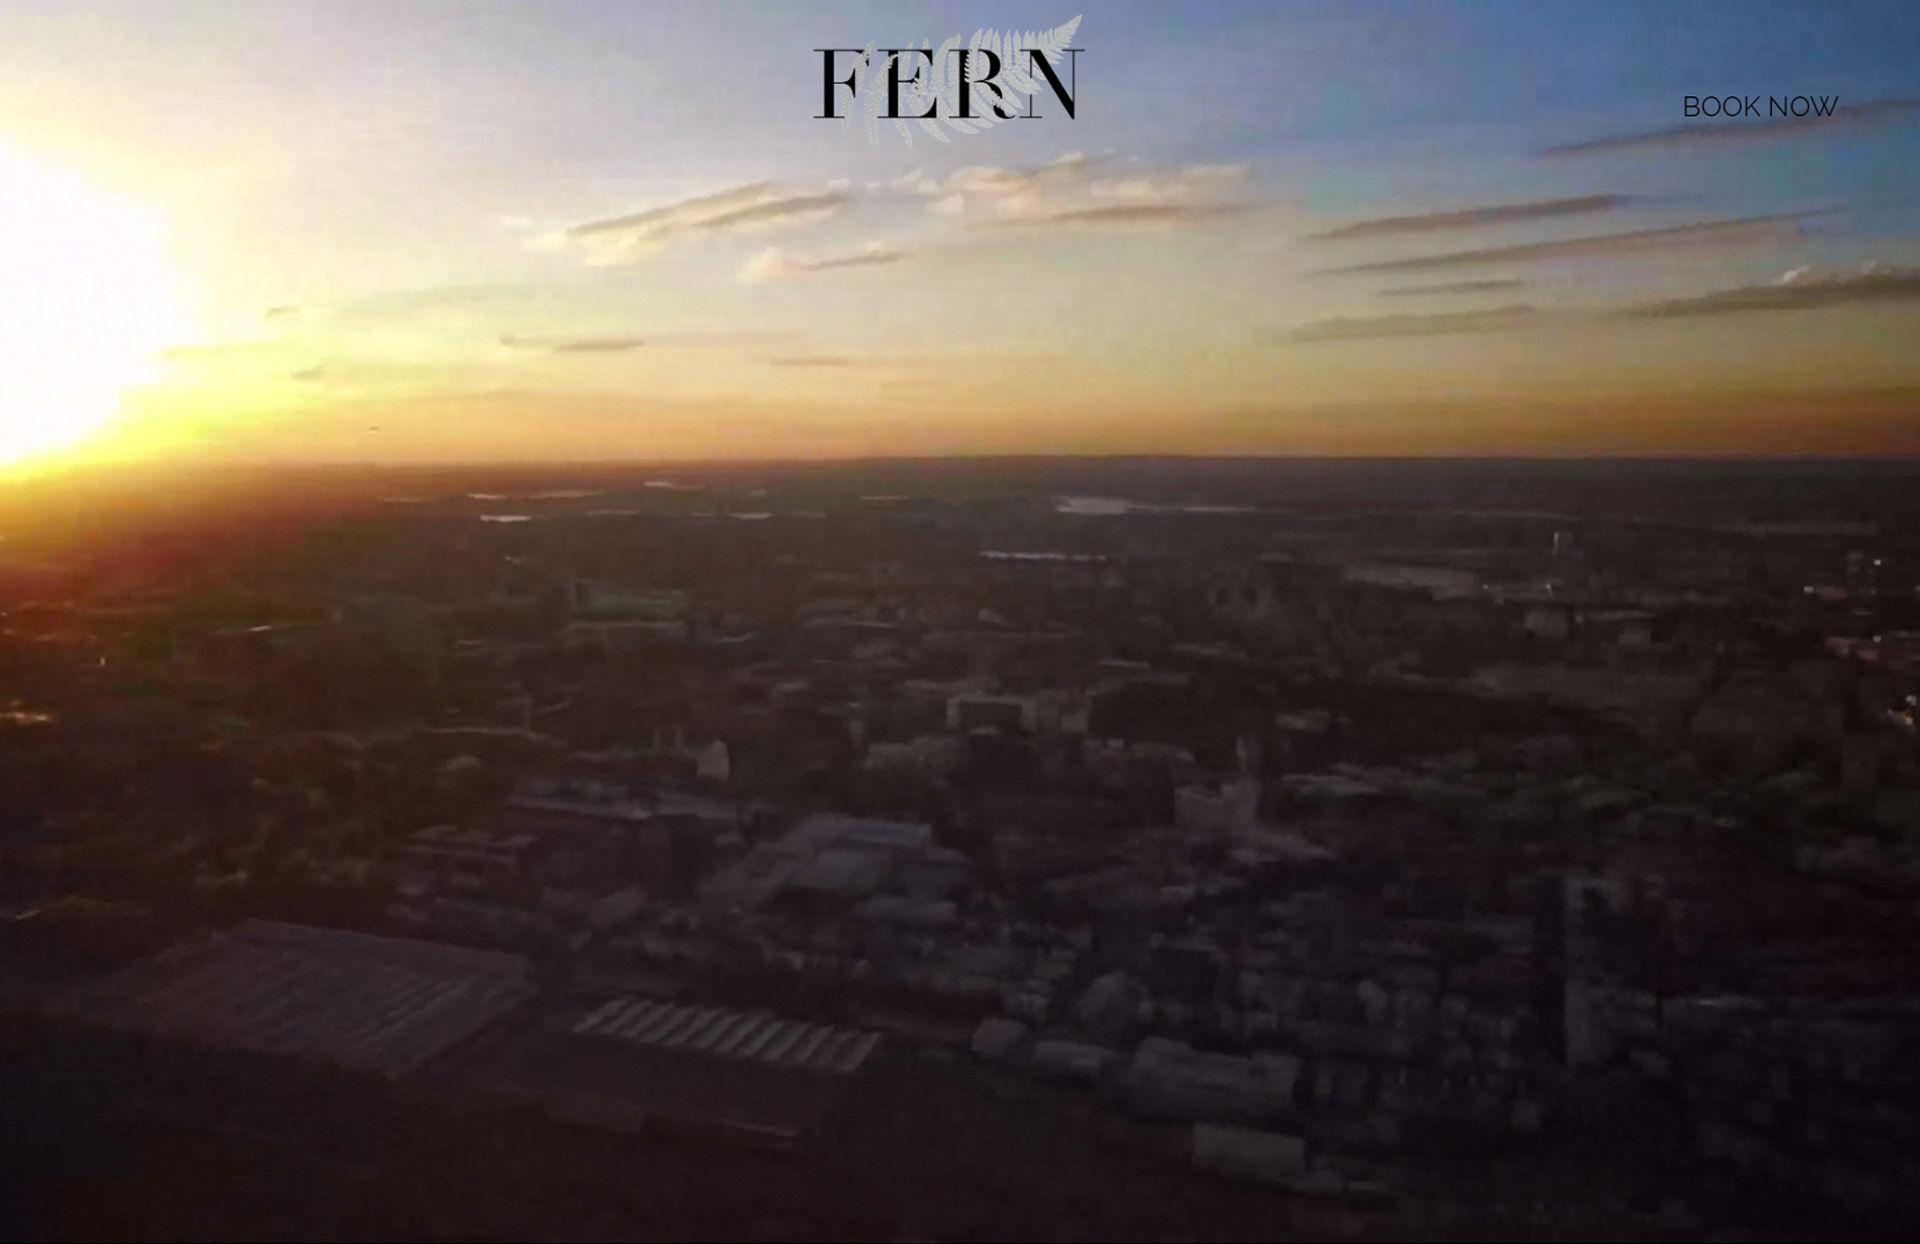 The Fern - WebGlobals